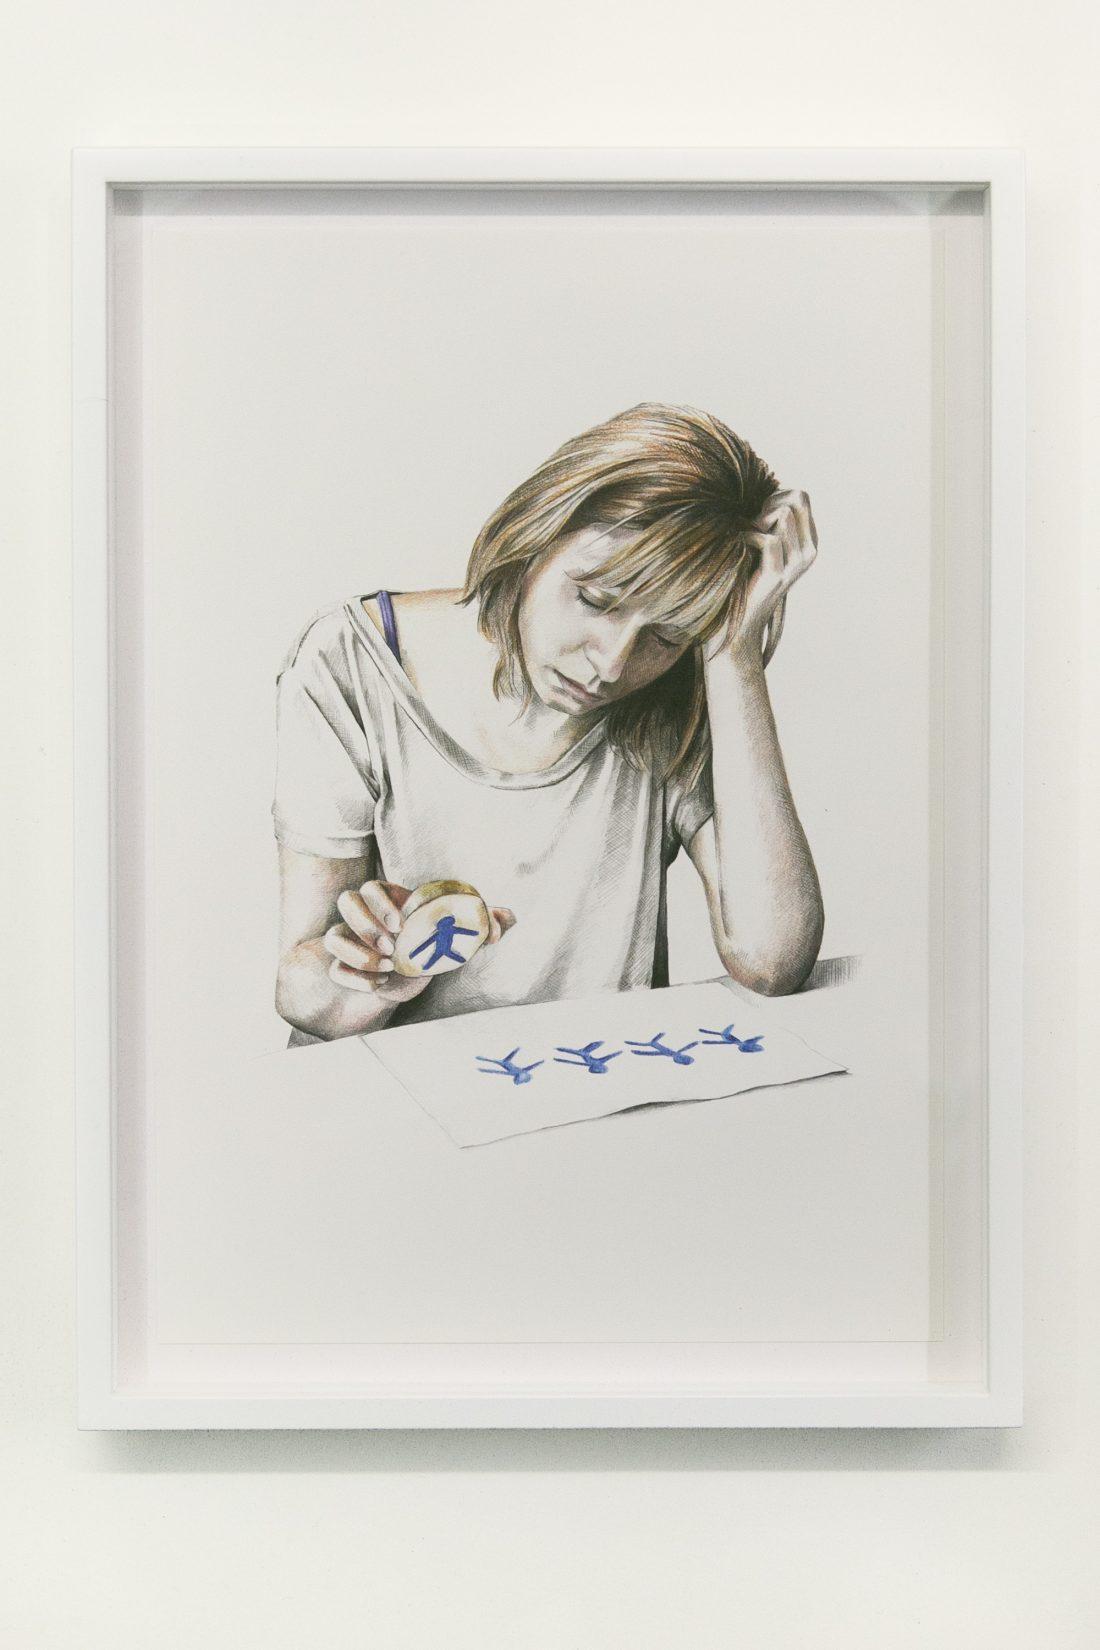 Edward Thomasson – Jasmine Printing, 2013